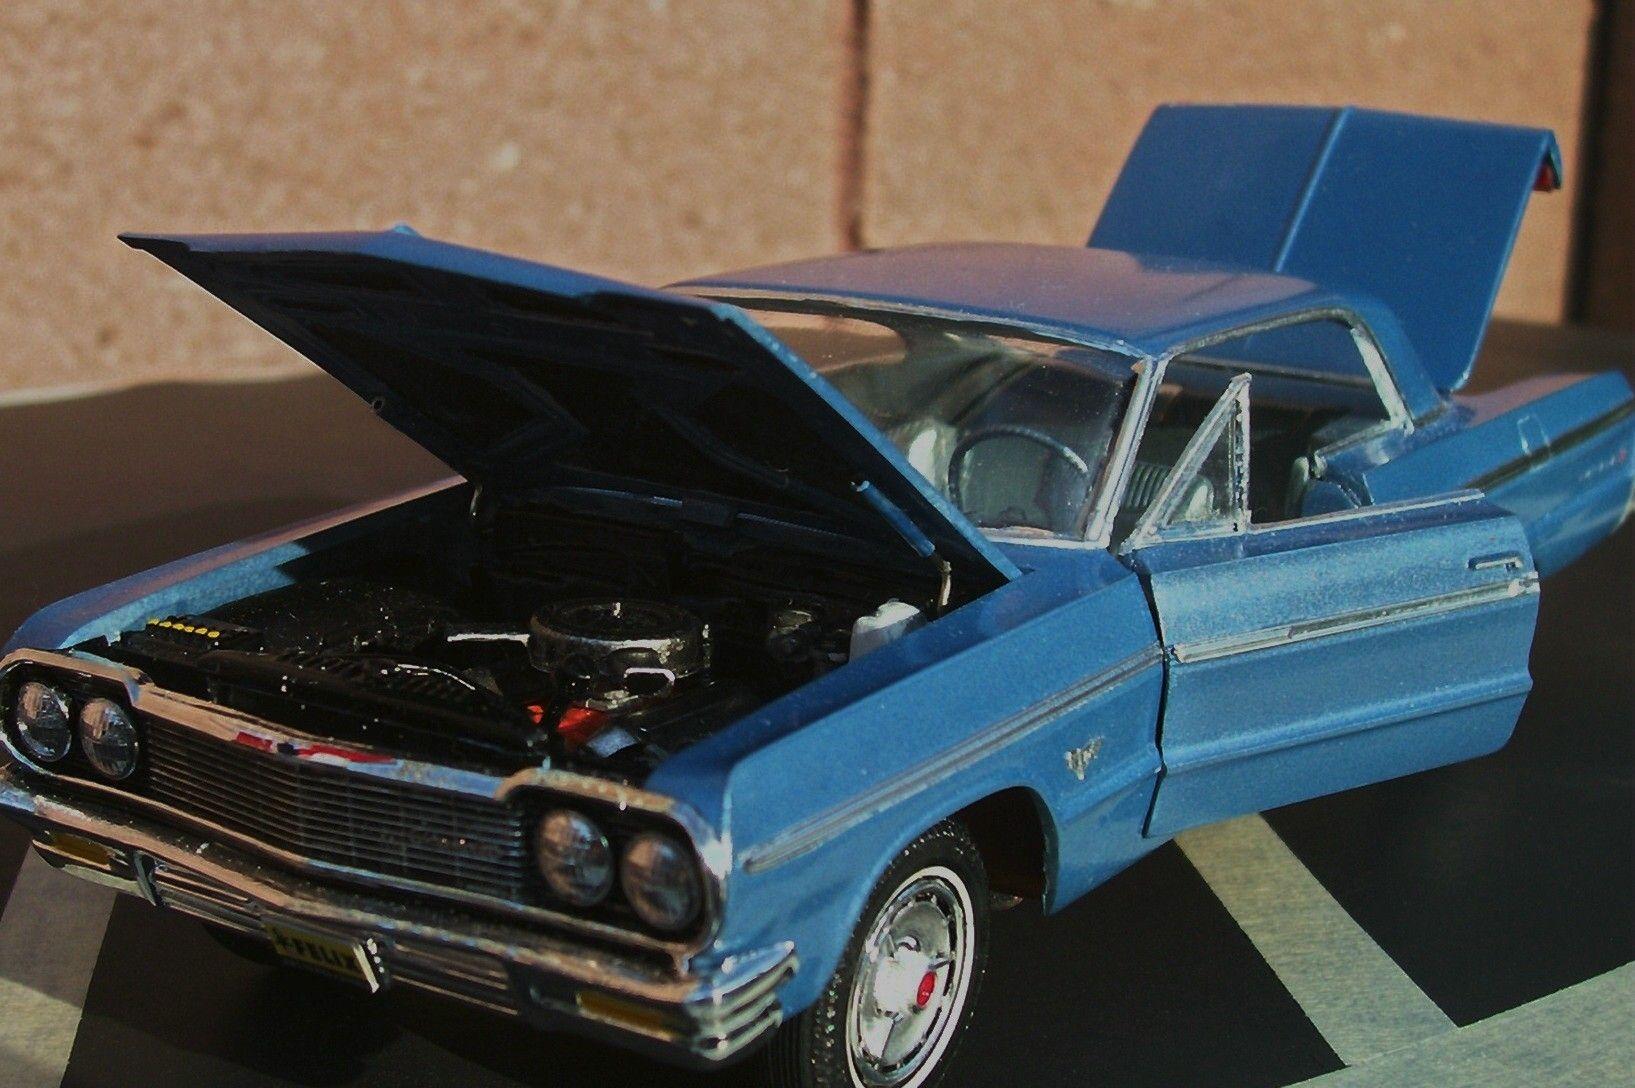 1964 chevy impala 1 25 scale model car